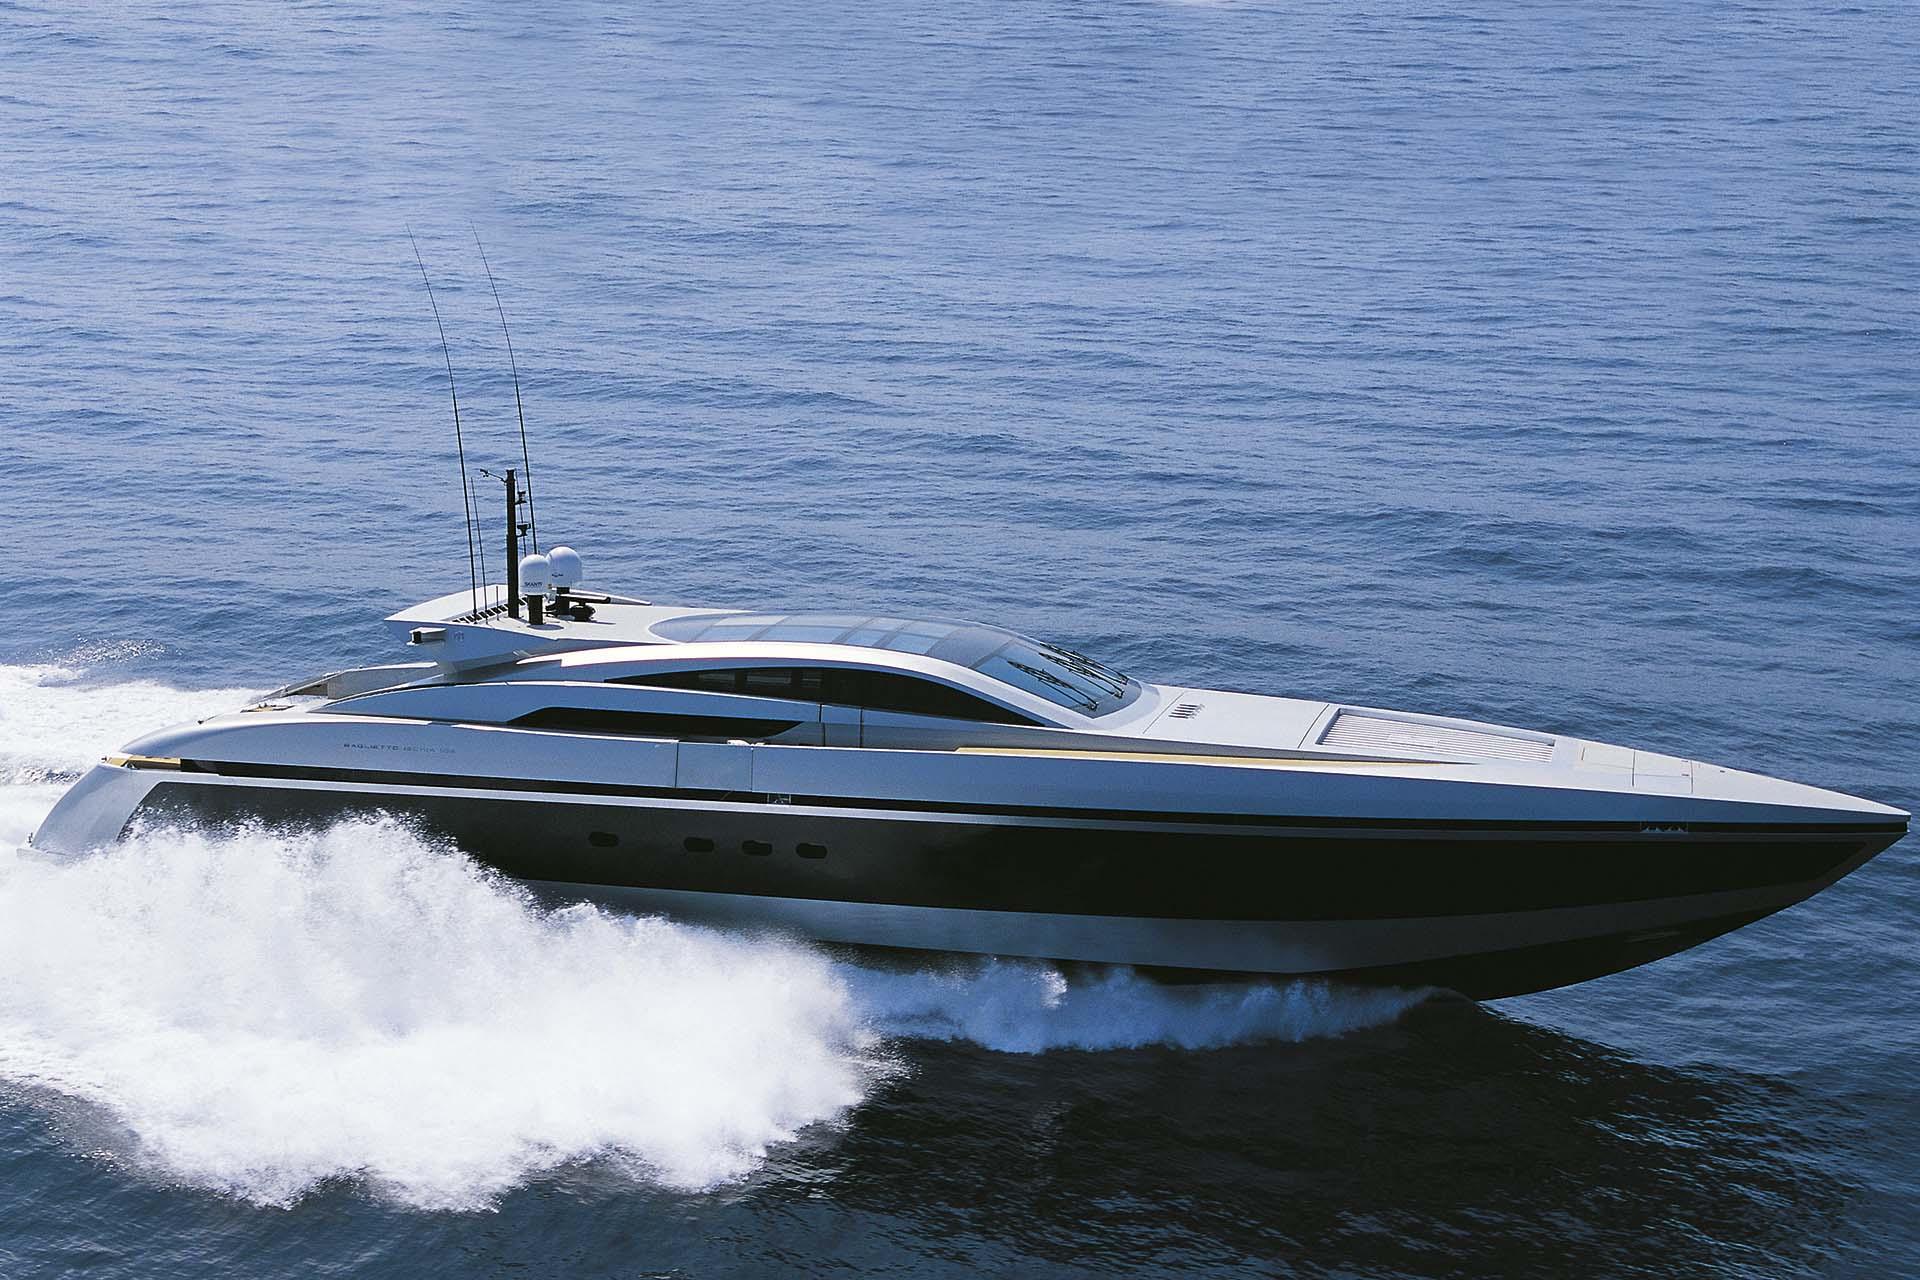 baglietto - ASTARTE - Paskowsky Yacht Design